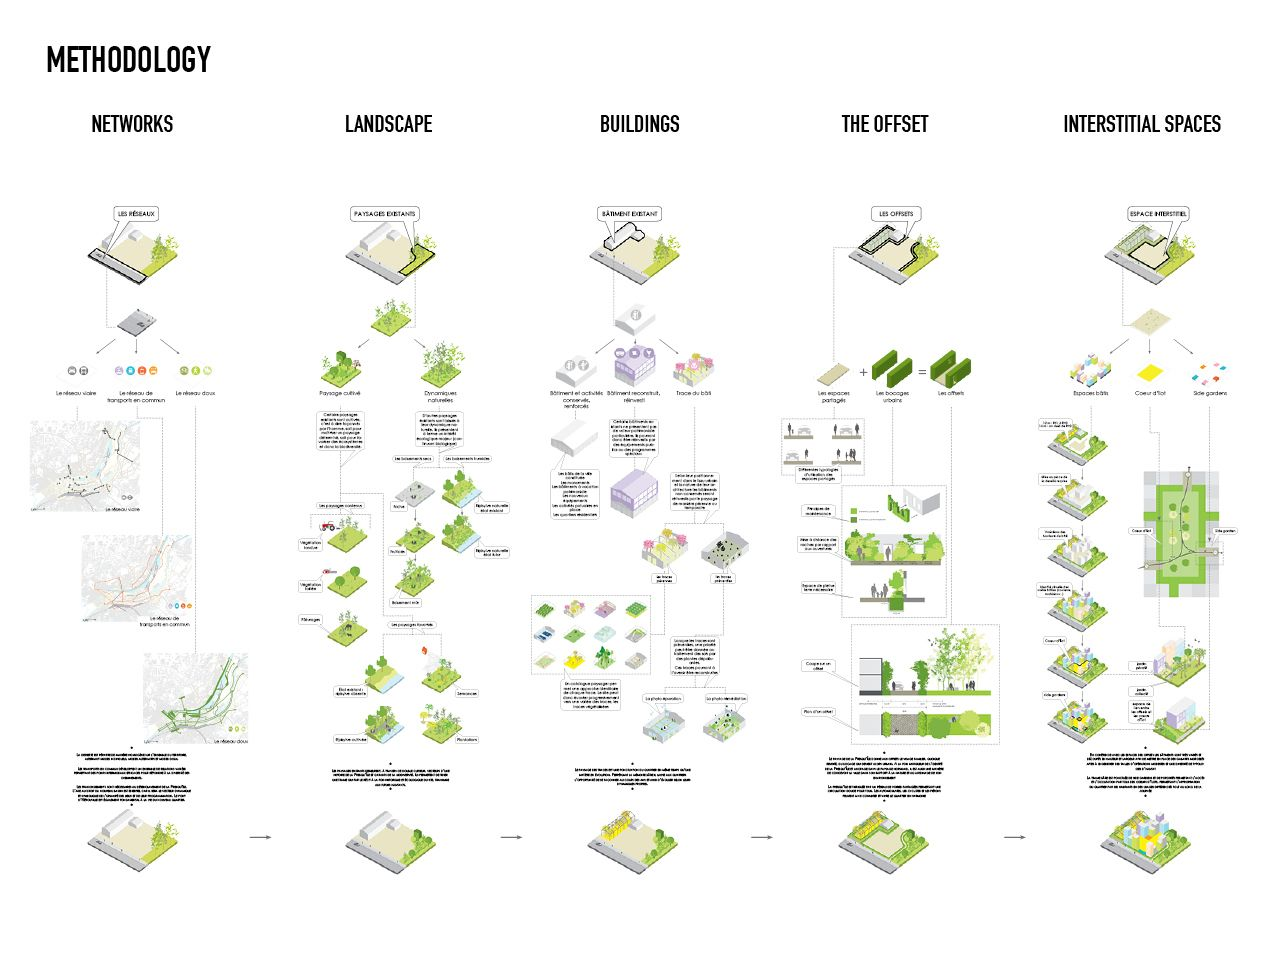 Gallery Of Mvrdv Releases New Images Of 600 Hectare La Grande Mosaique Masterplan In Caen 1 Landscape Diagram Architecture Concept Diagram Concept Diagram